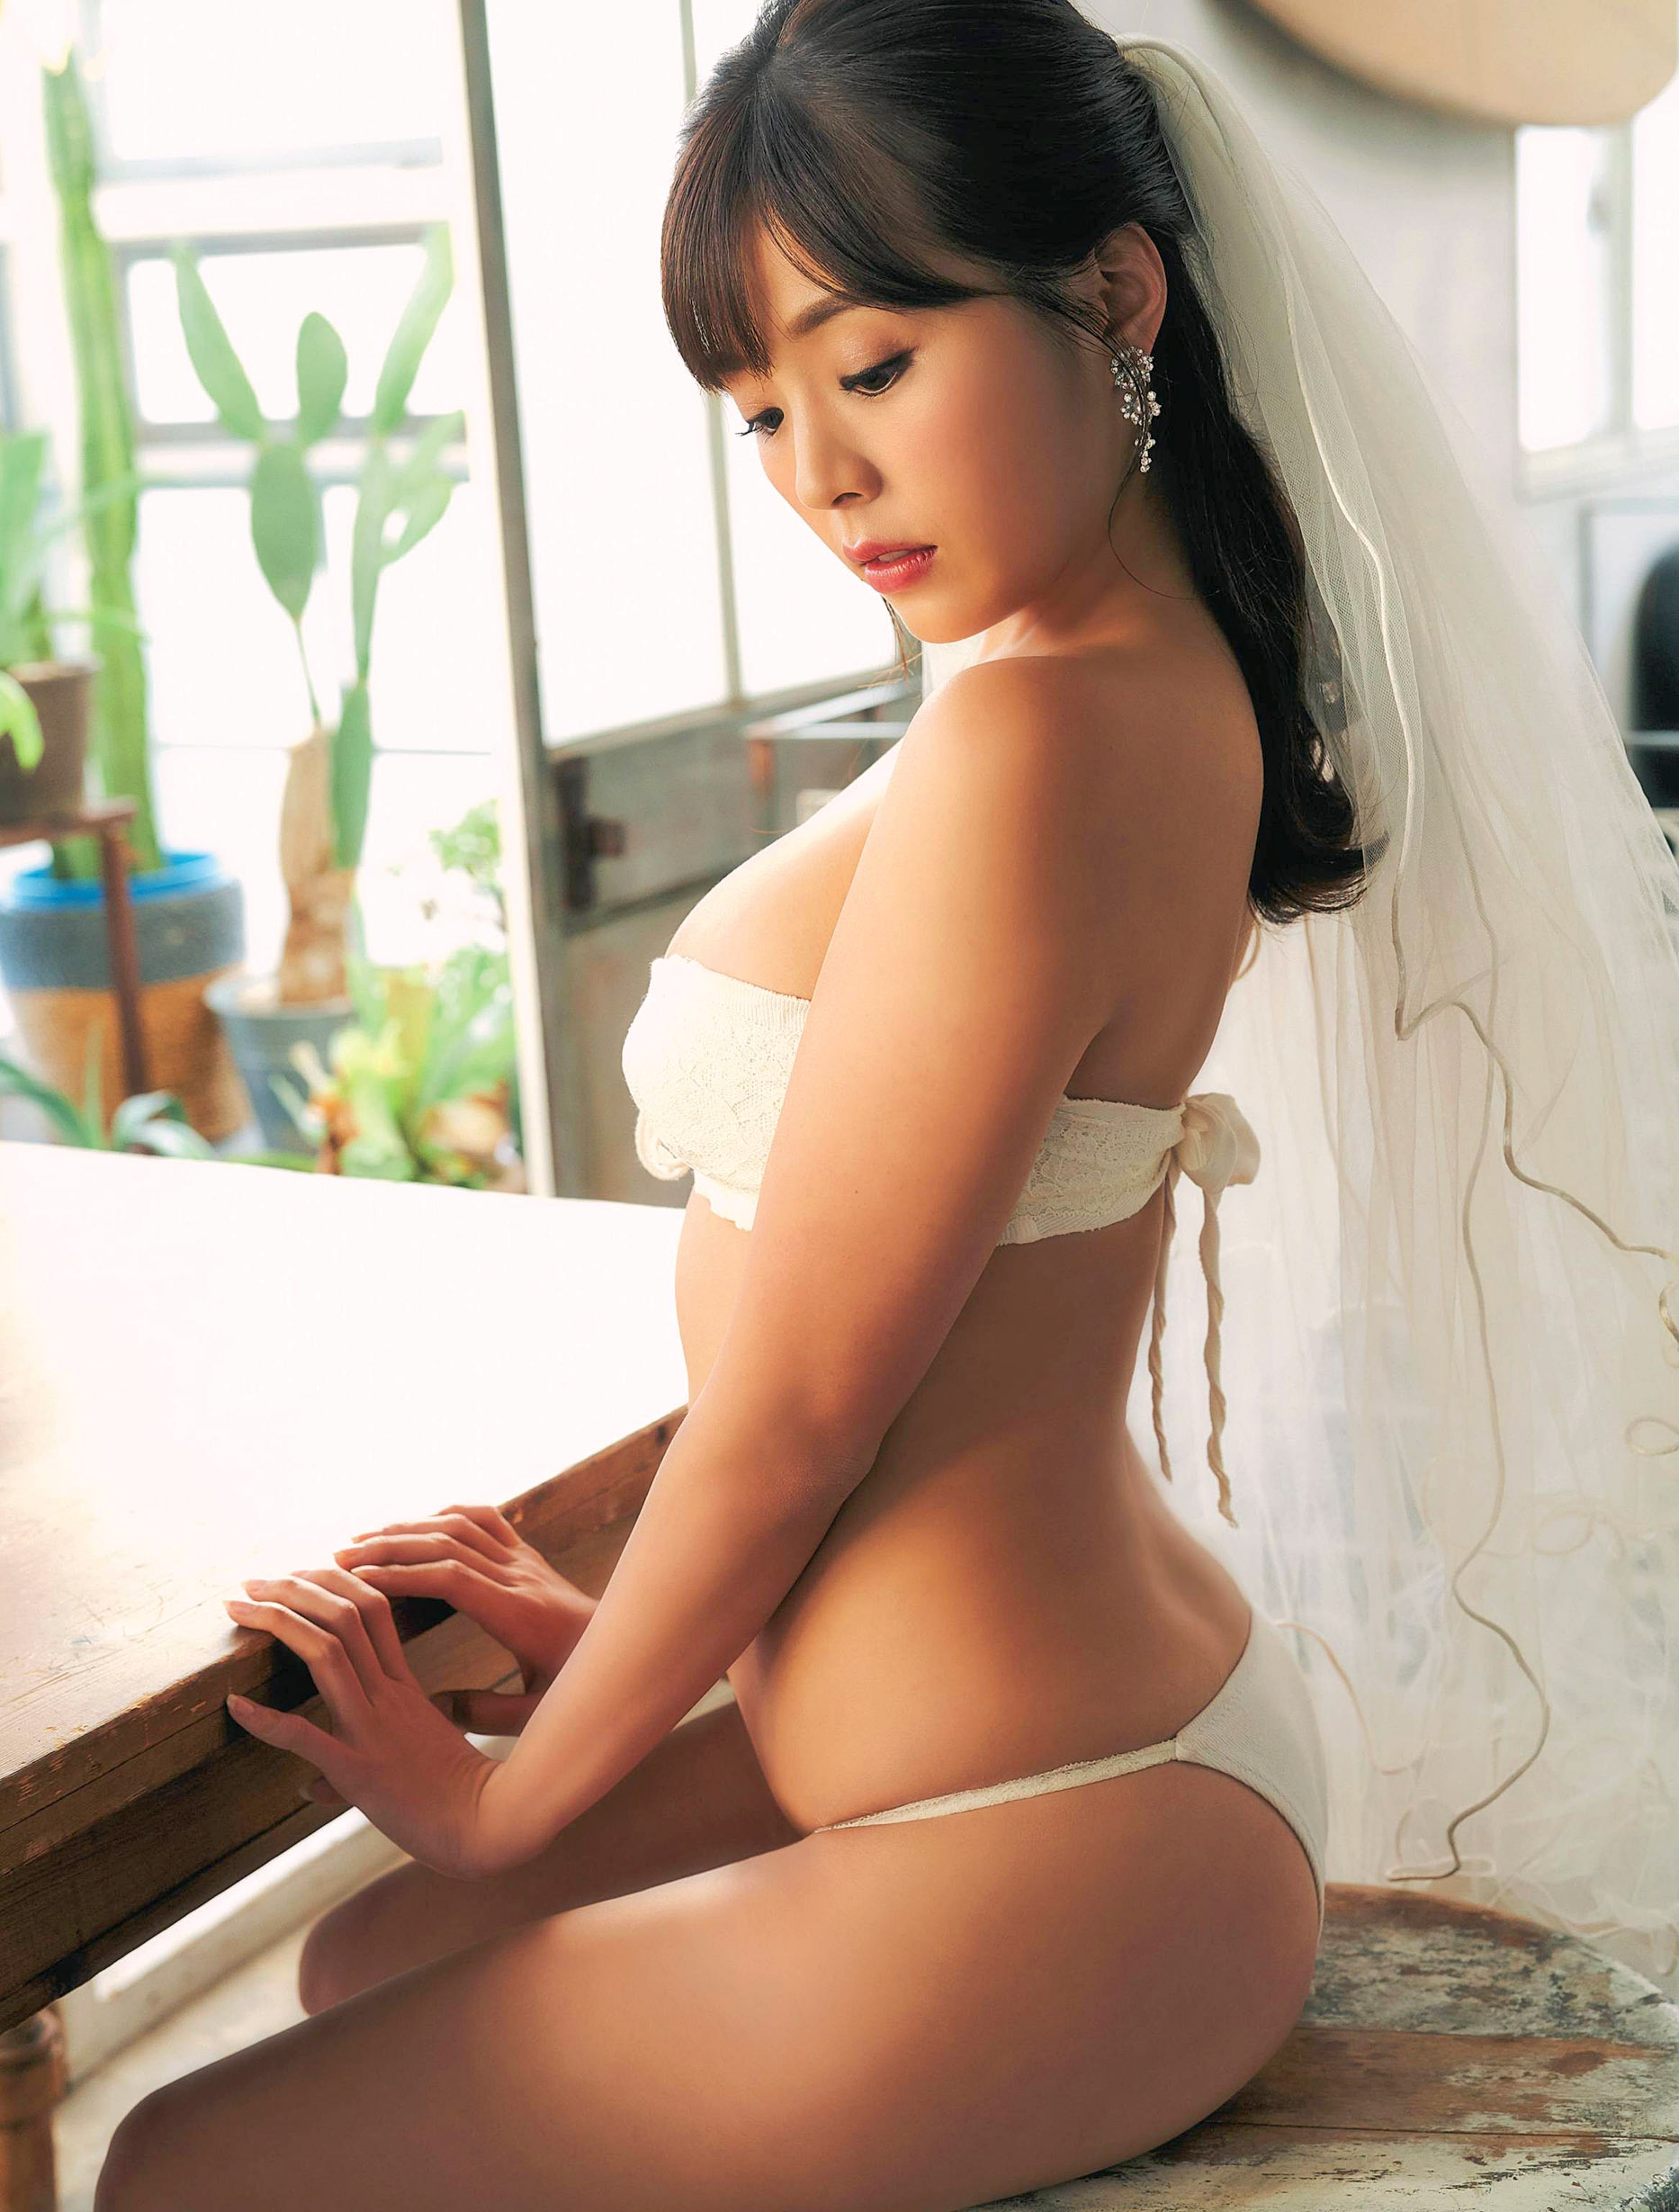 Natsuki Kawamura Weekly SPA 200204 02.jpg